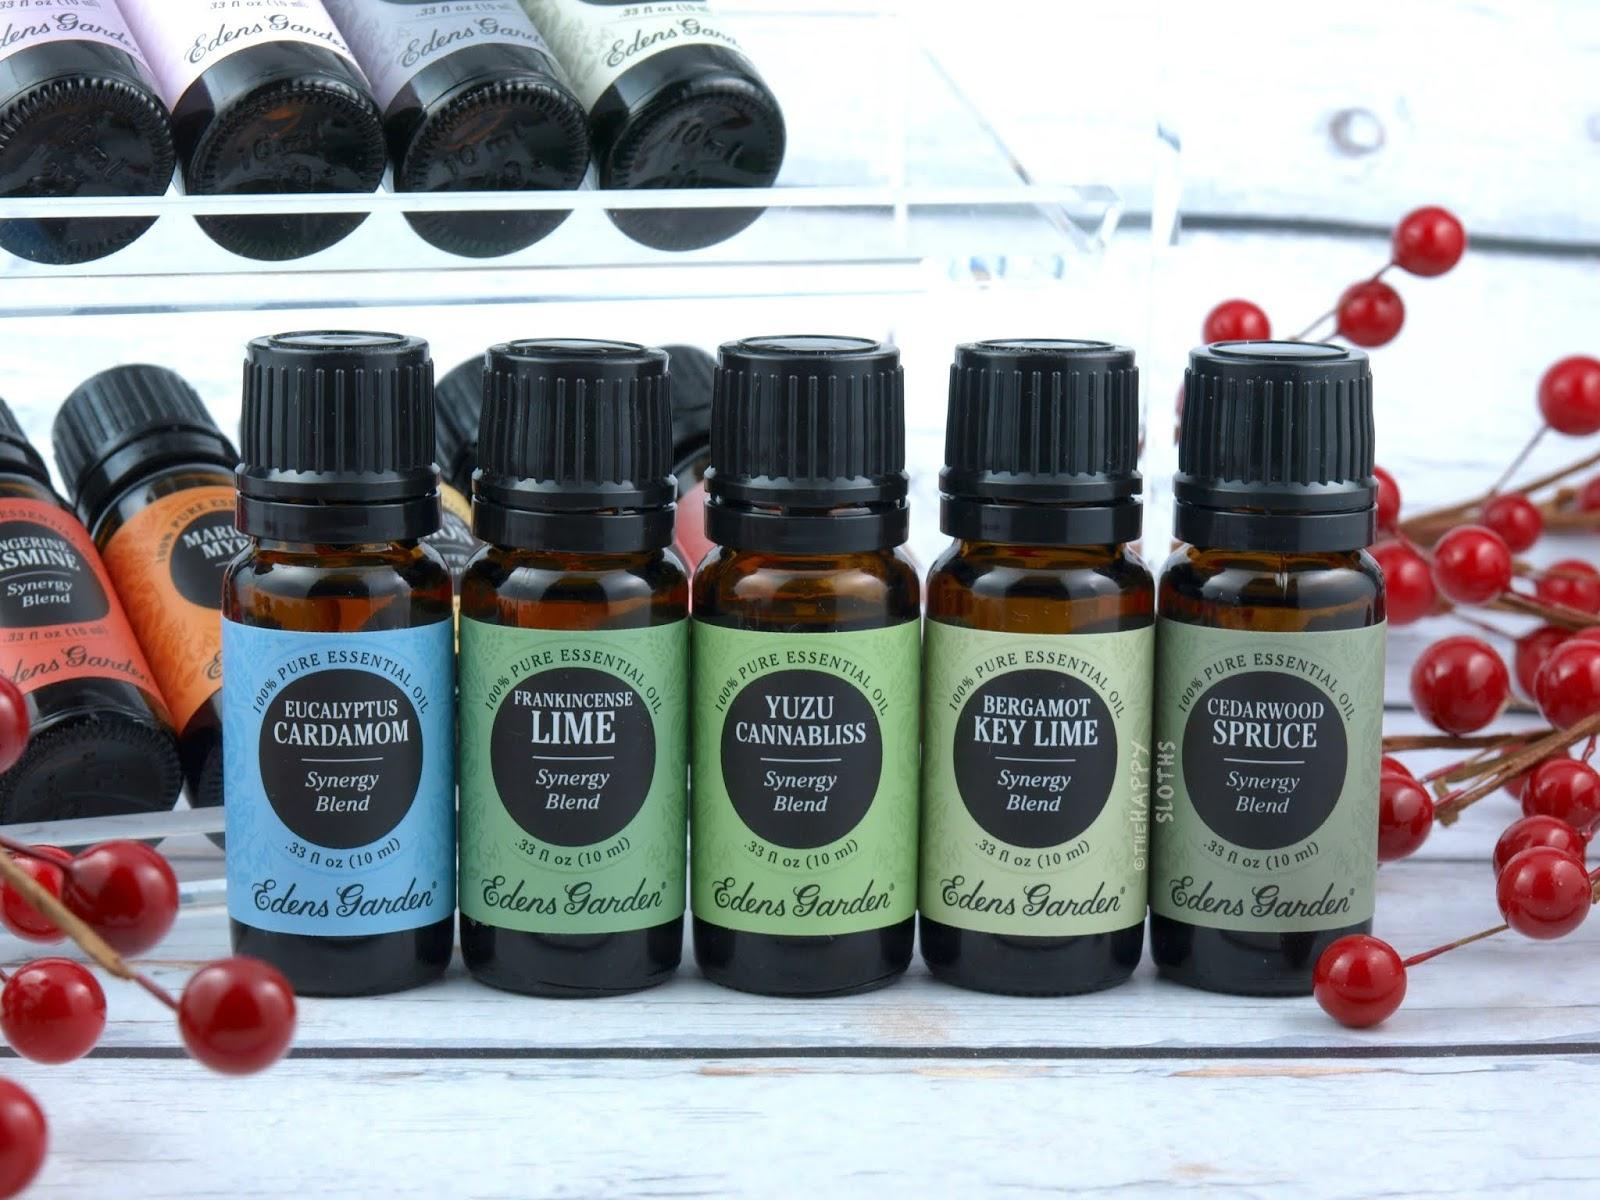 Edens garden new essential oil synergy blends - Edens garden essential oils reviews ...